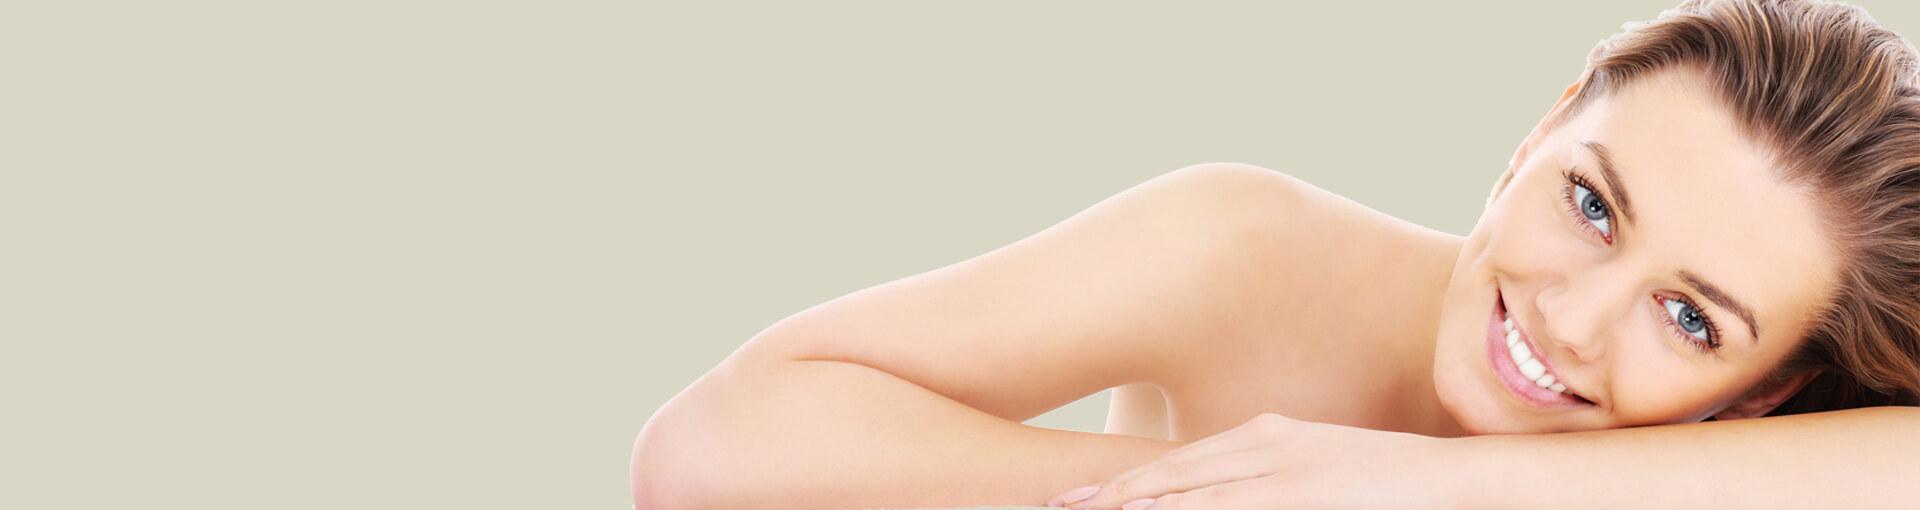 Moles & Skin Tags - drs skin care